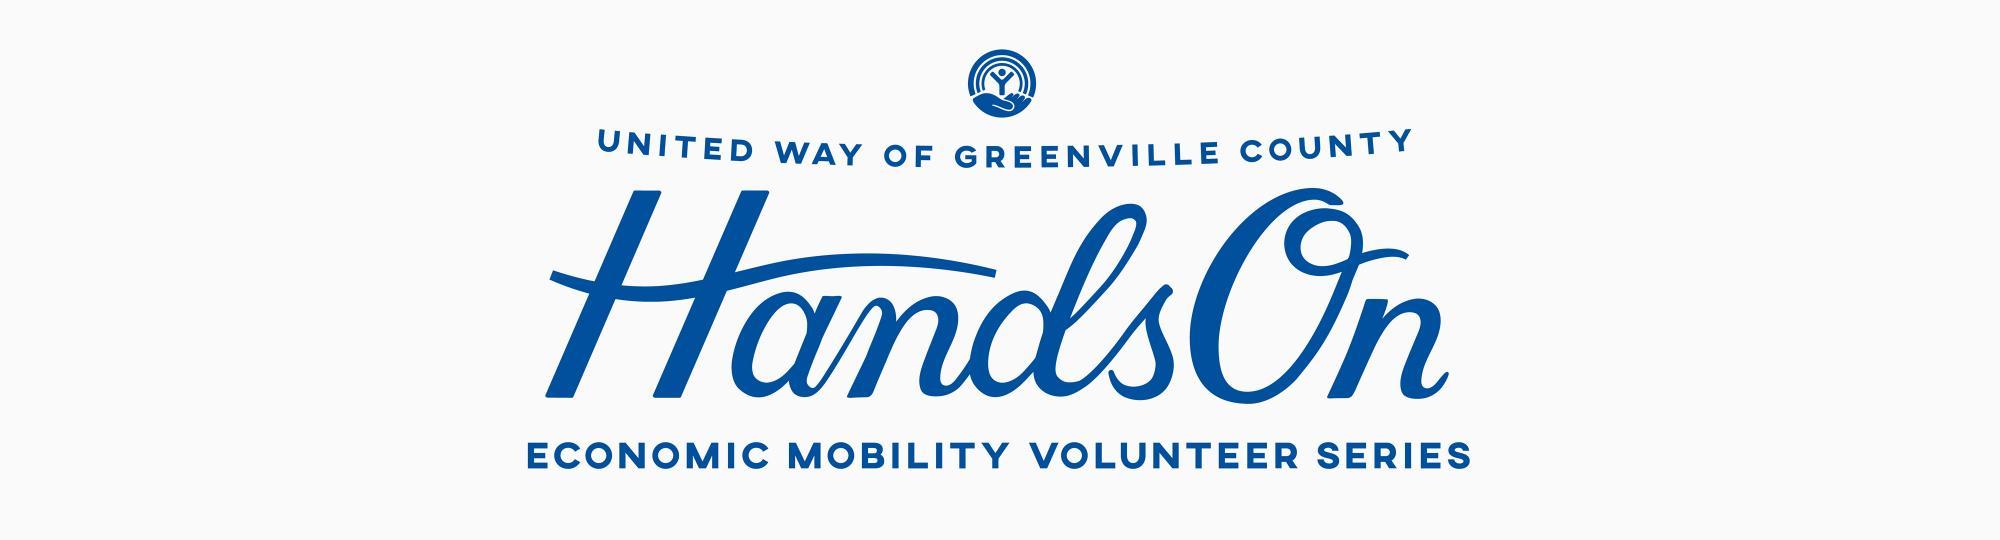 Hands On: Economic Mobility Volunteer Series